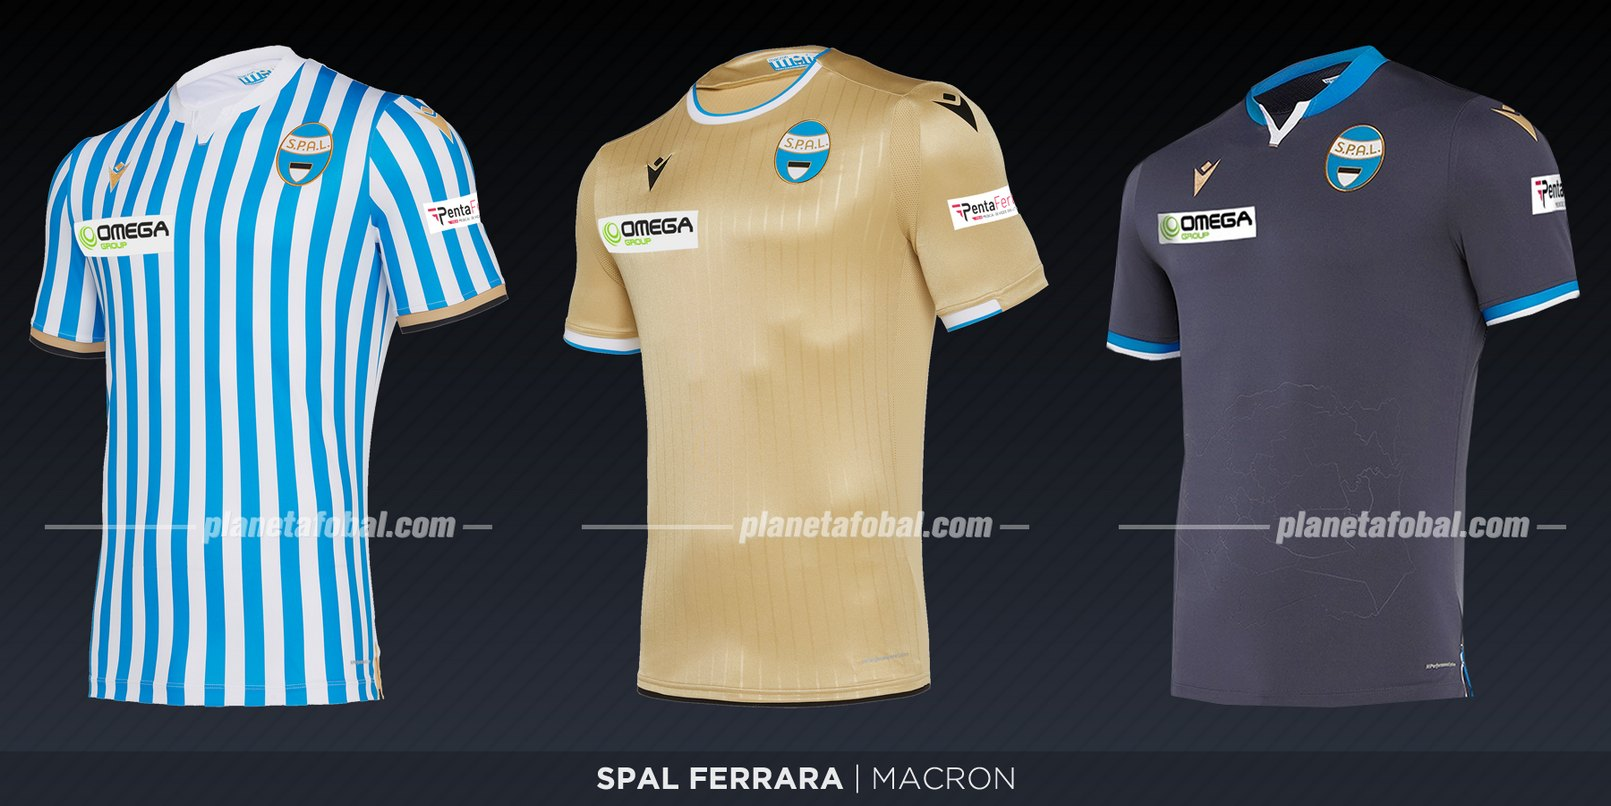 SPAL Ferrara (Macron) | Camisetas de la Serie A 2019-2020